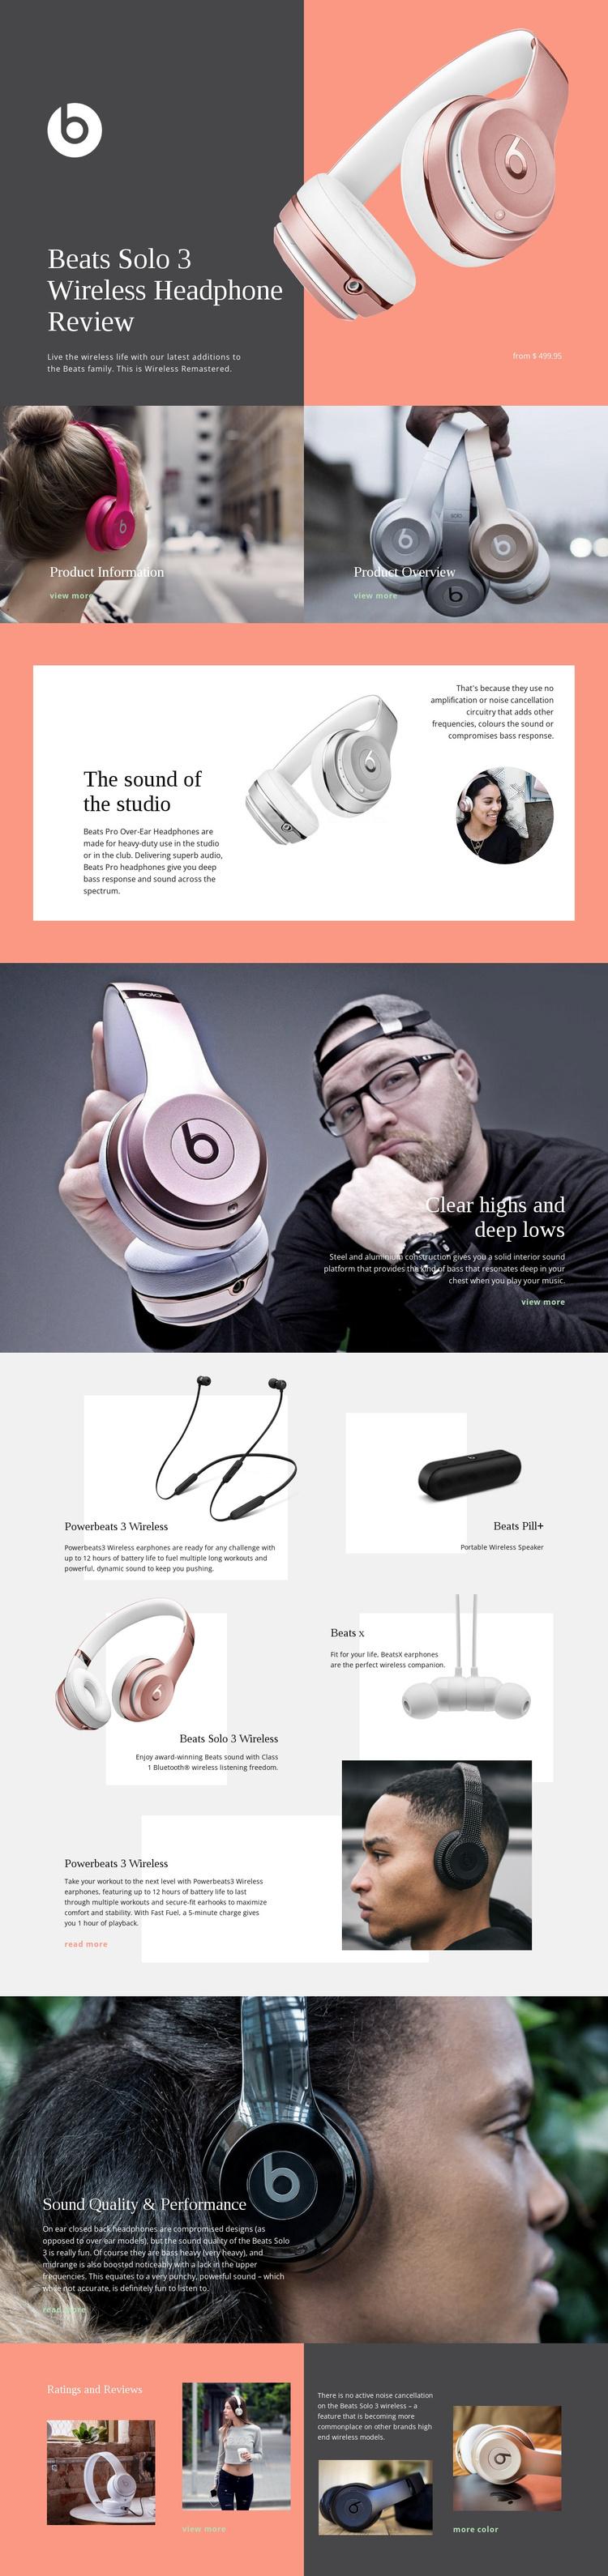 Beats Wireless Joomla Template